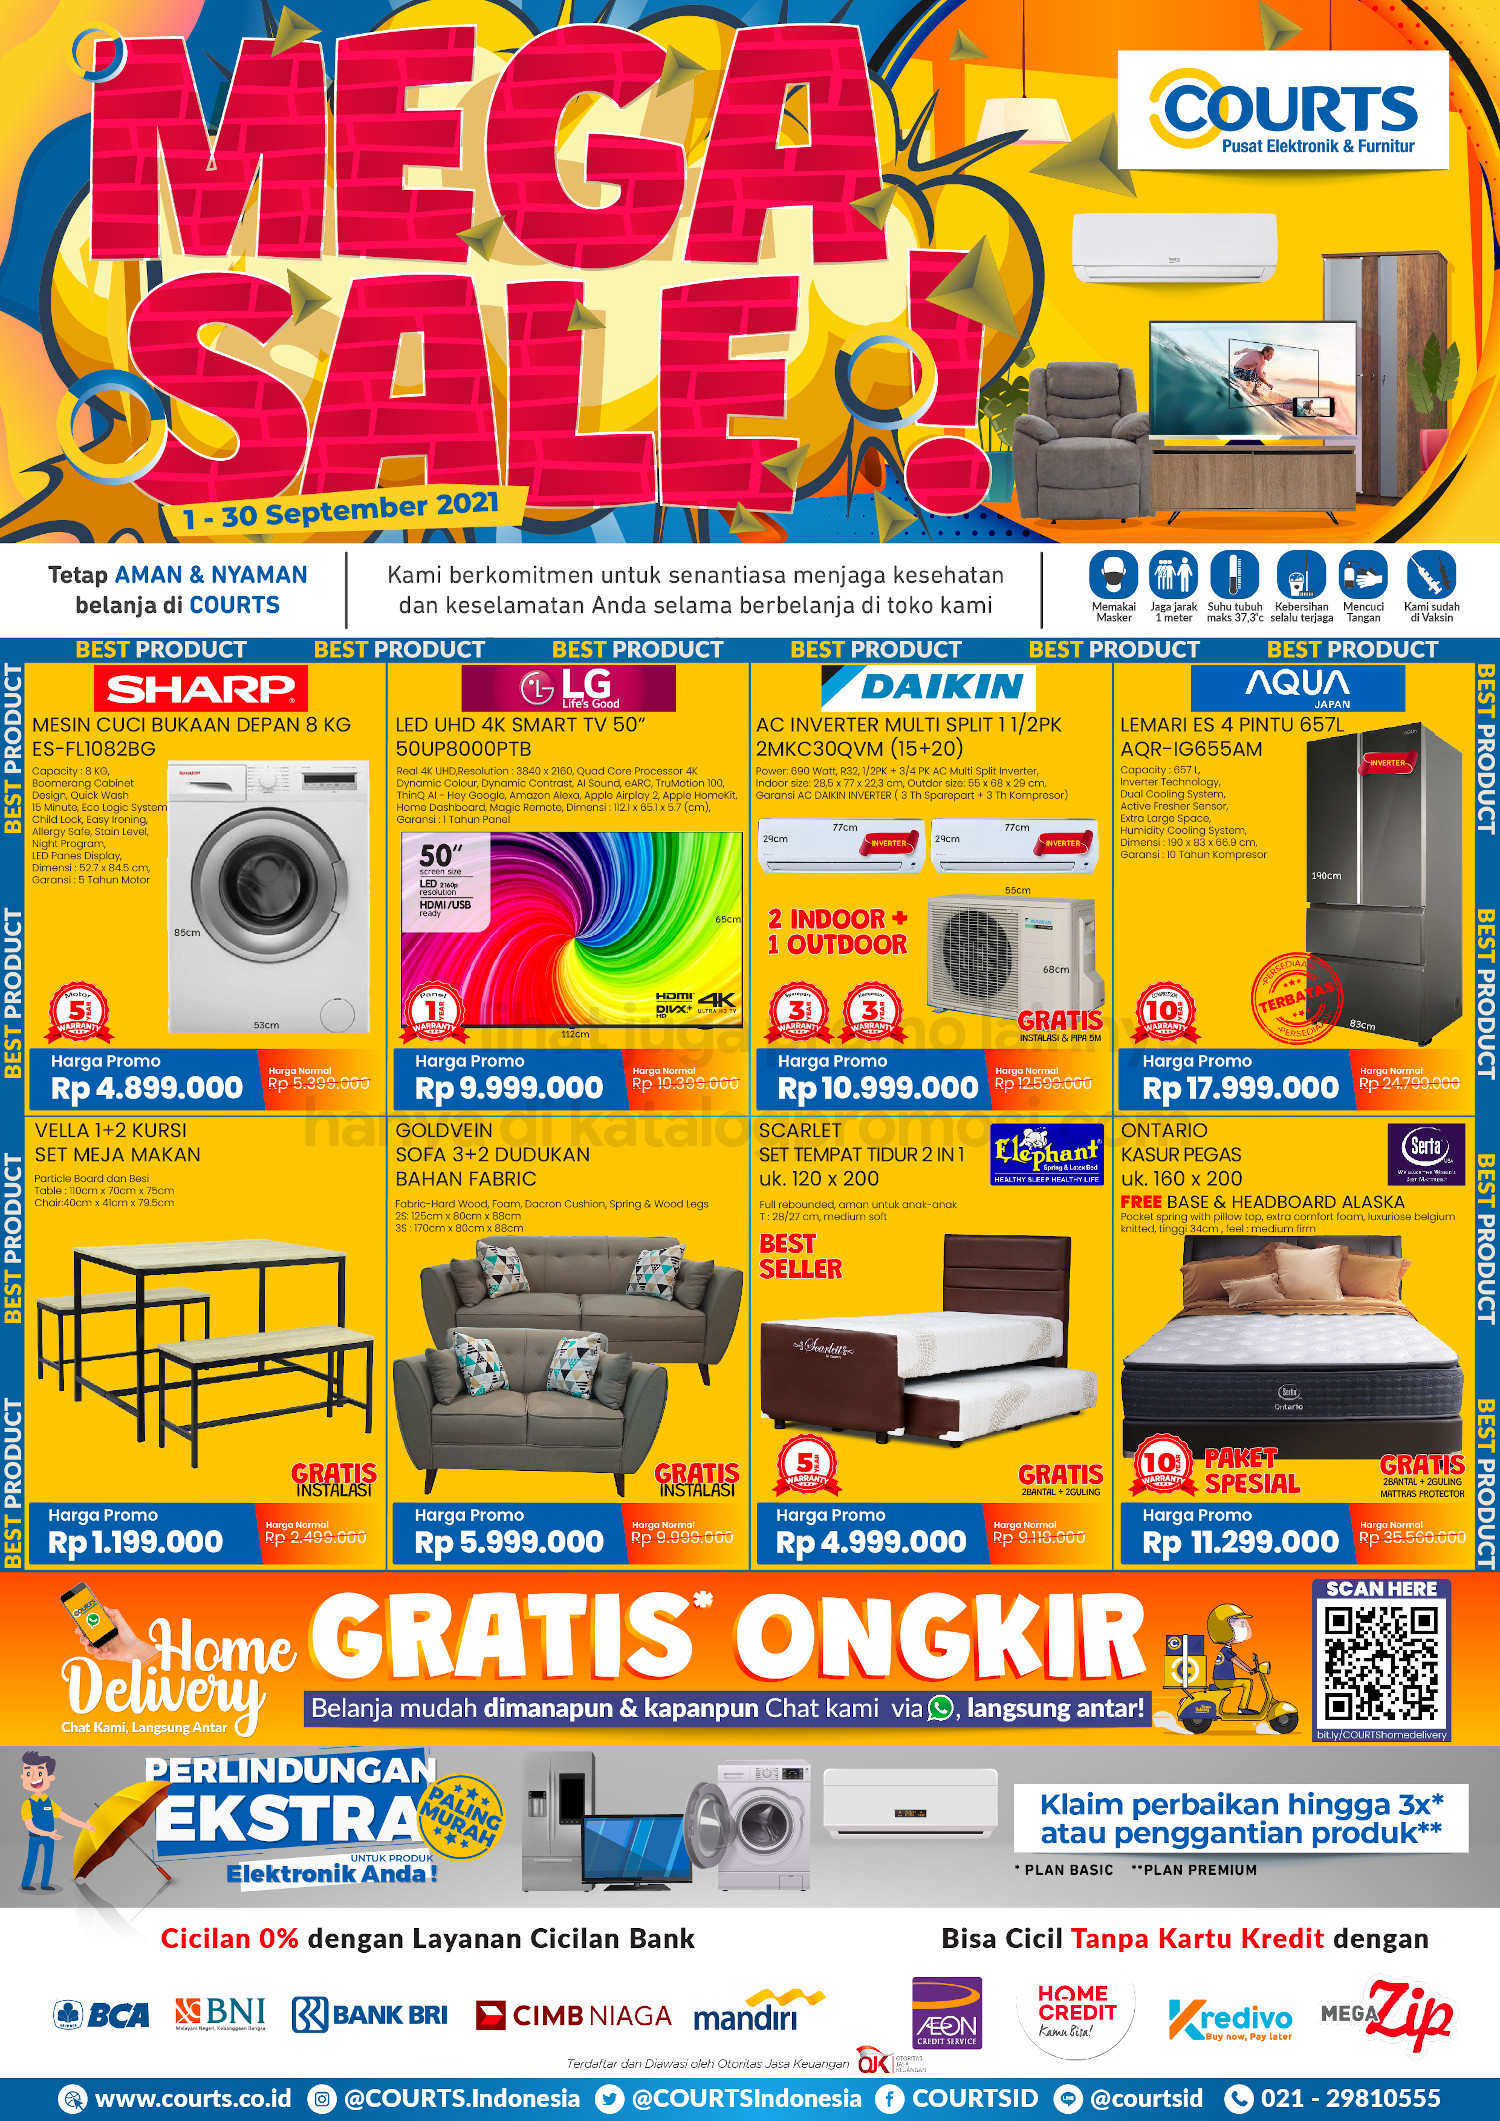 Katalog Promo COURTS MEGA SALE! periode 01-30 SEPTEMBER 2021